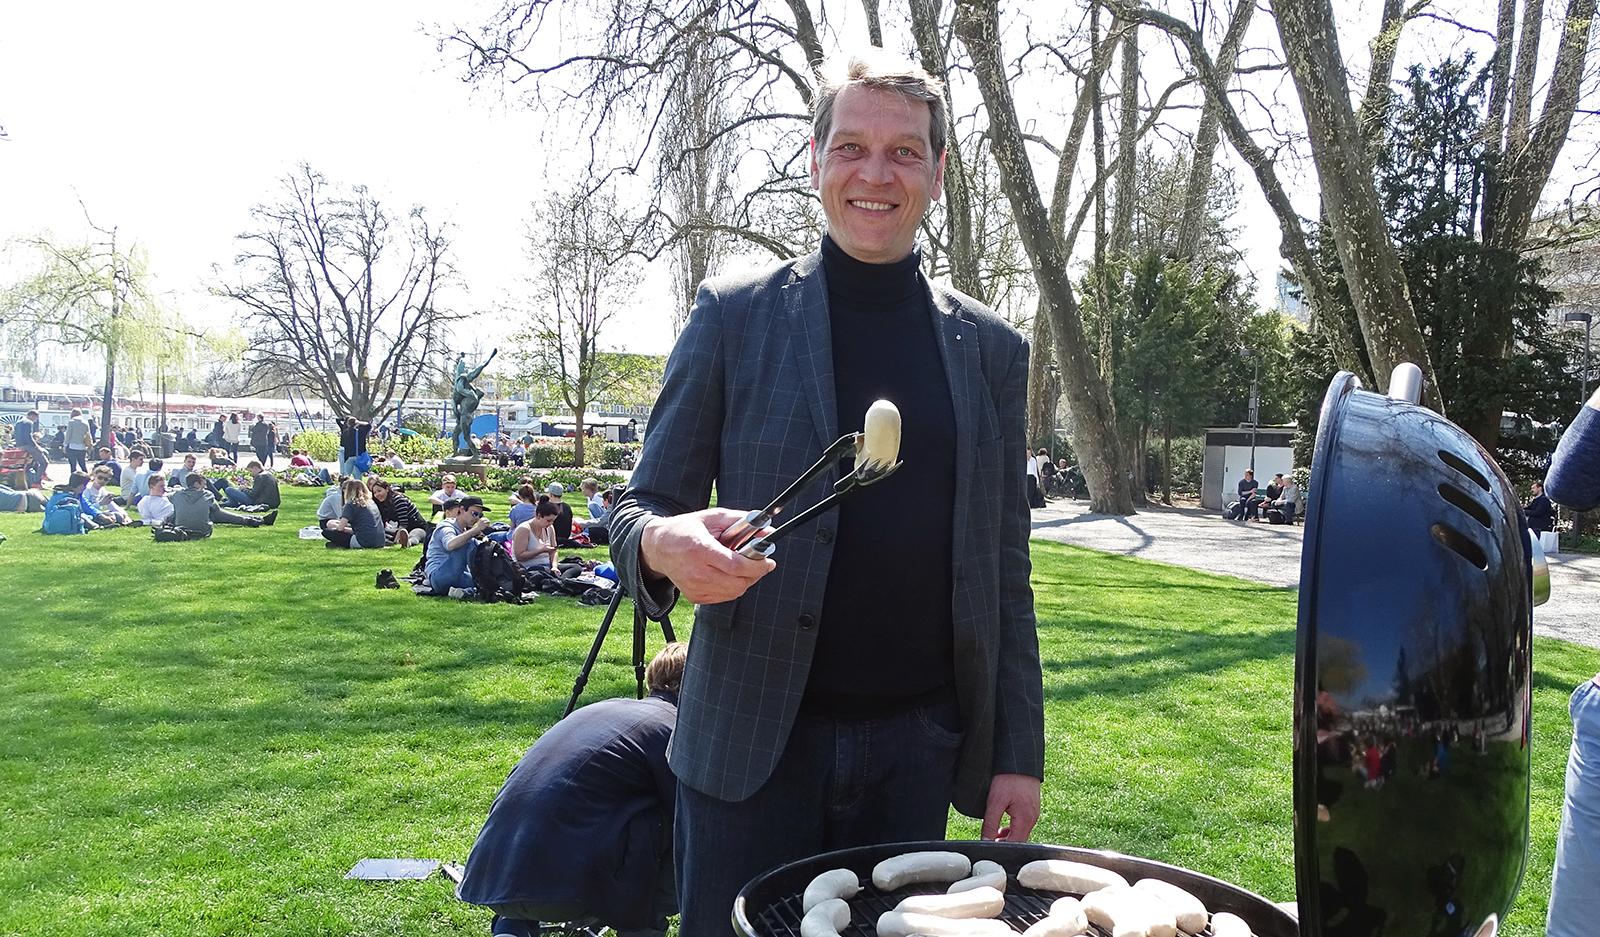 Daniel Lütolf, Leiter Crowdfunding bei der Luzerner Kantonalbank, stellt sich gleich selbst an den Grill.